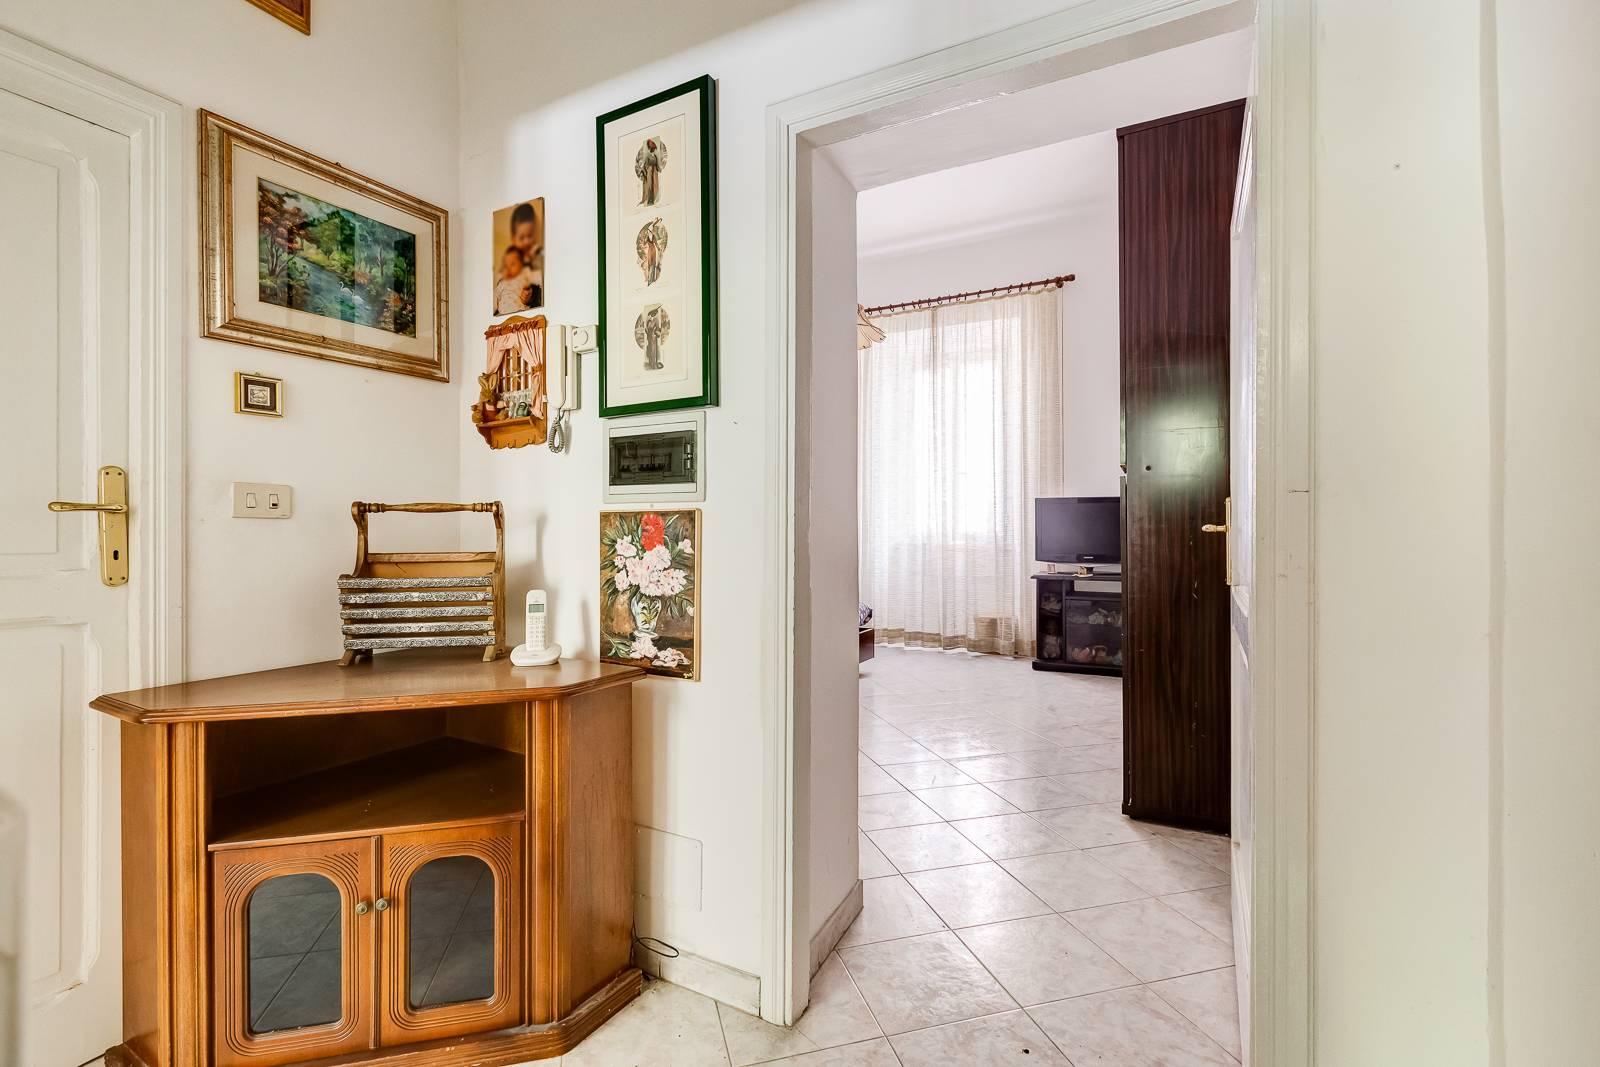 1118416793 Monolocale in Via Umberto Guarnieri, Roma, Zona Tor Pignattara